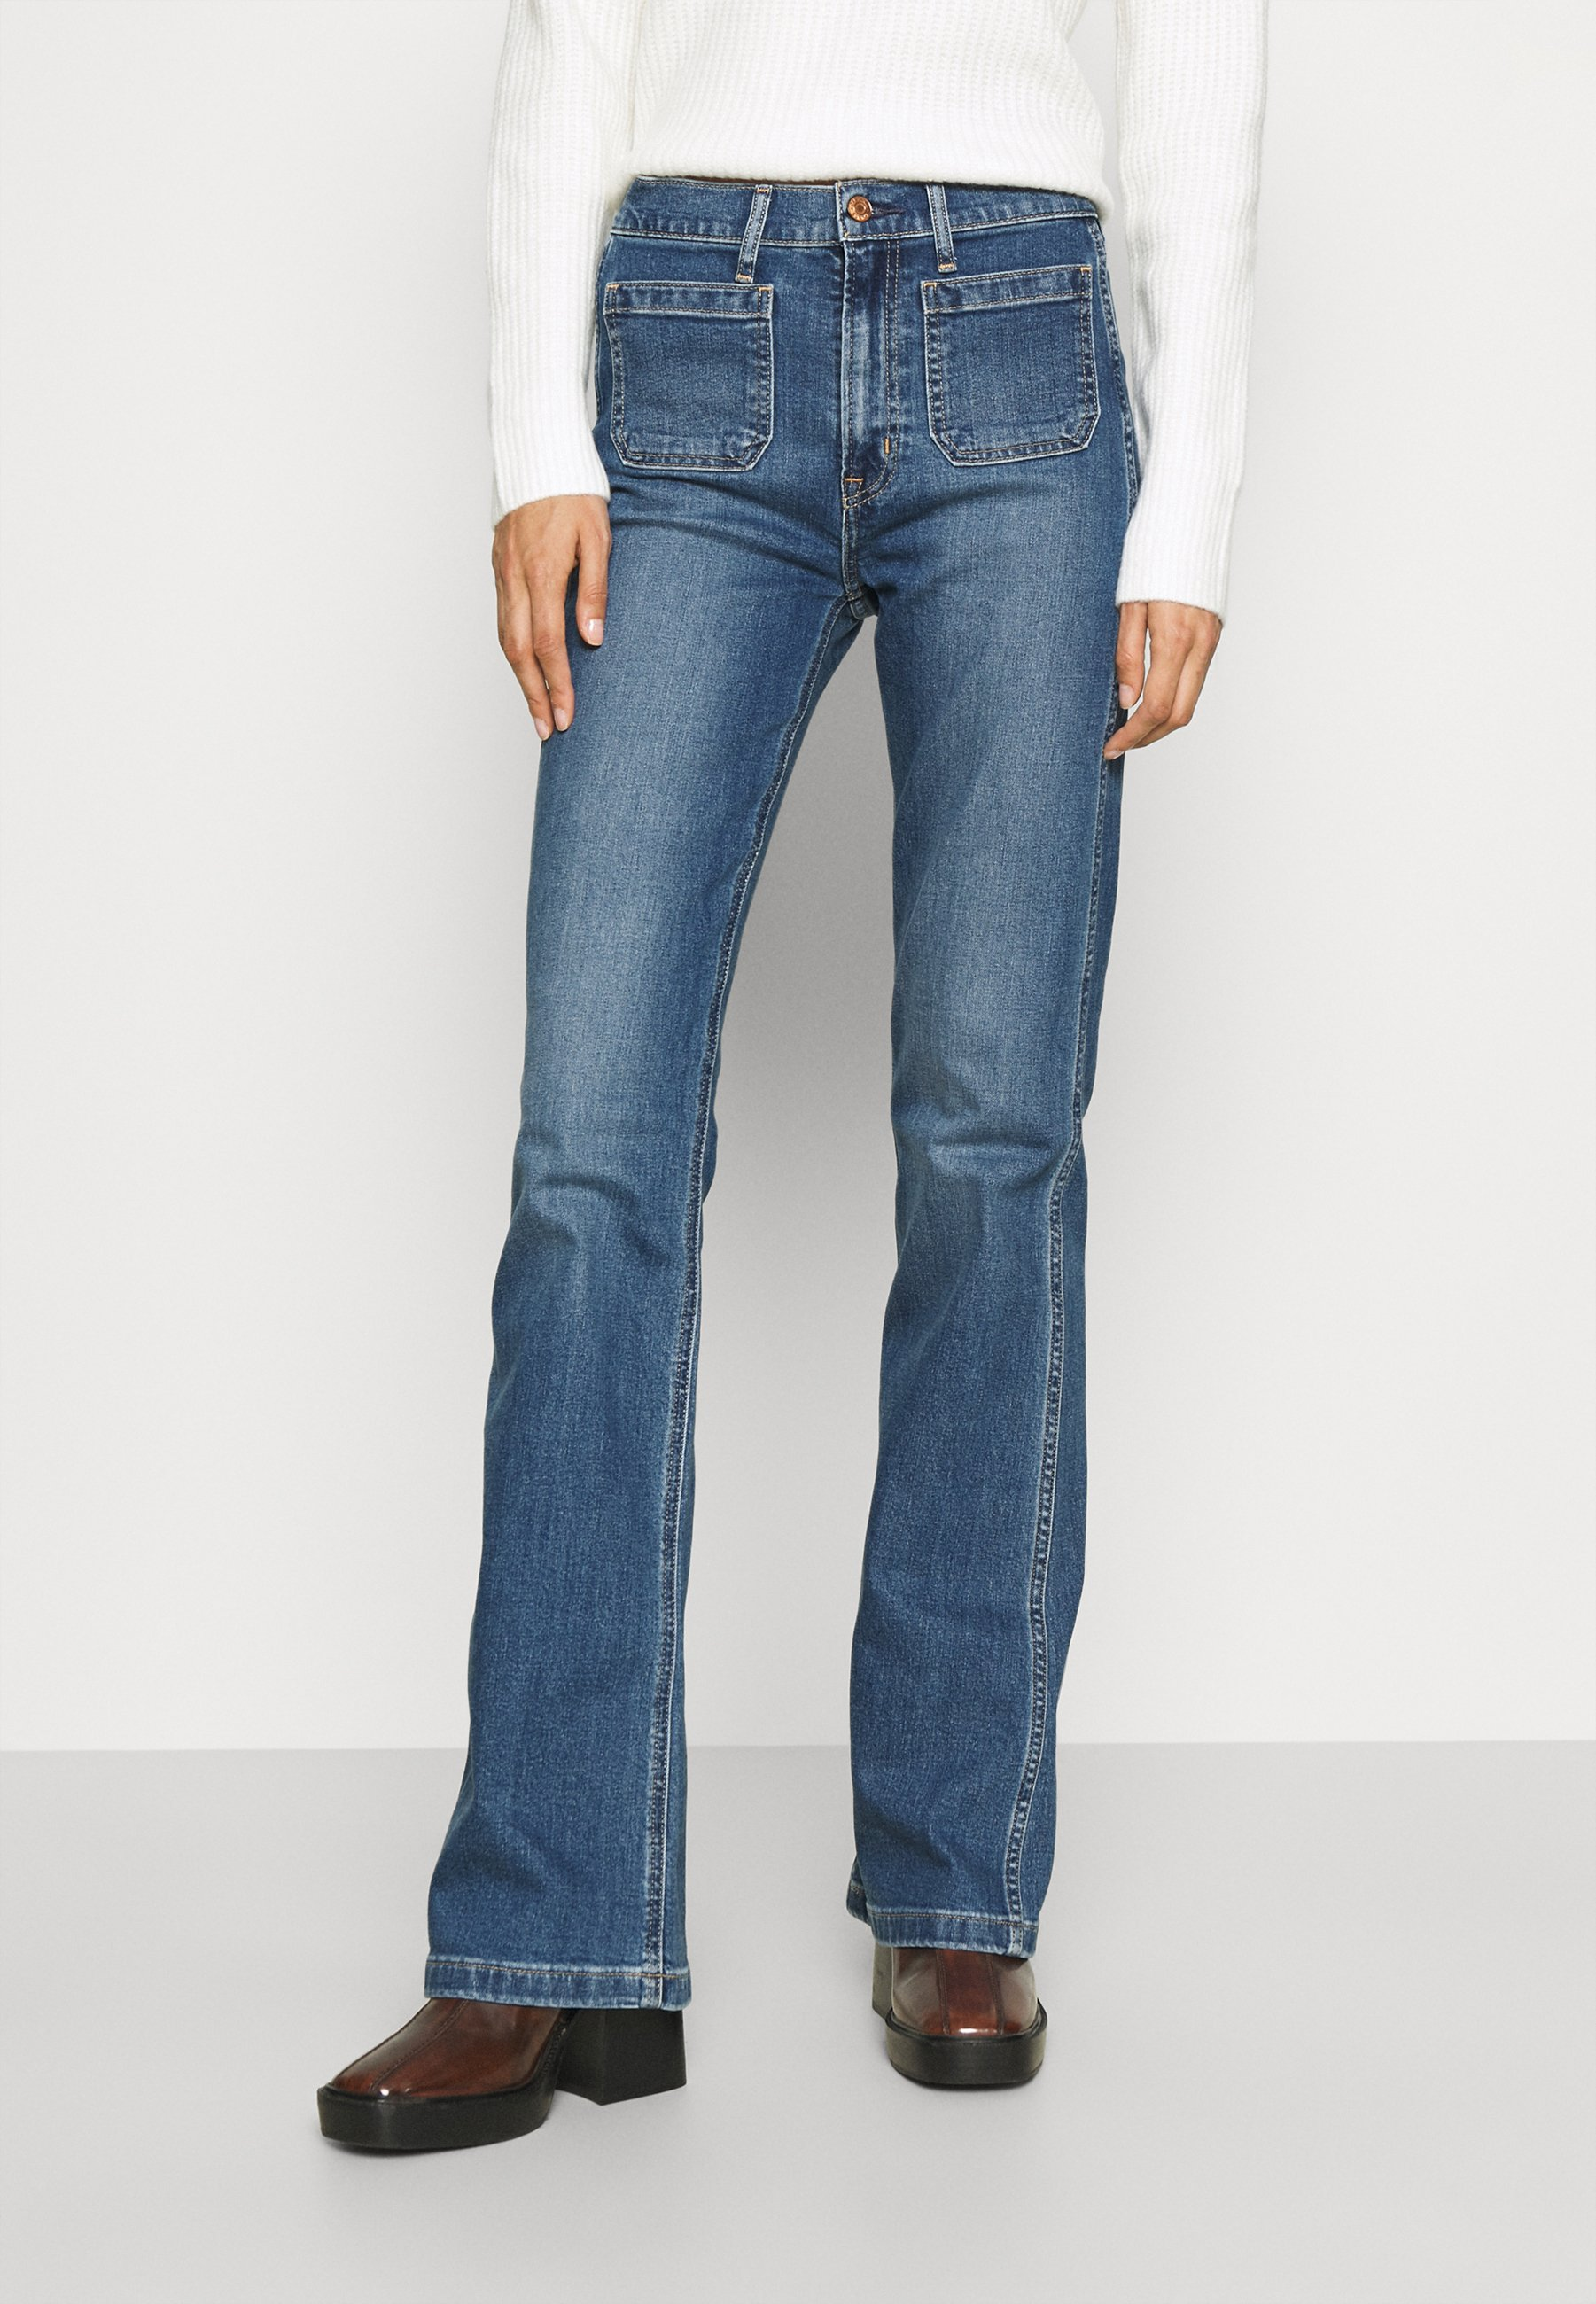 Damer FLARE HERON PATCH POCKET - Flared jeans - medium indigo